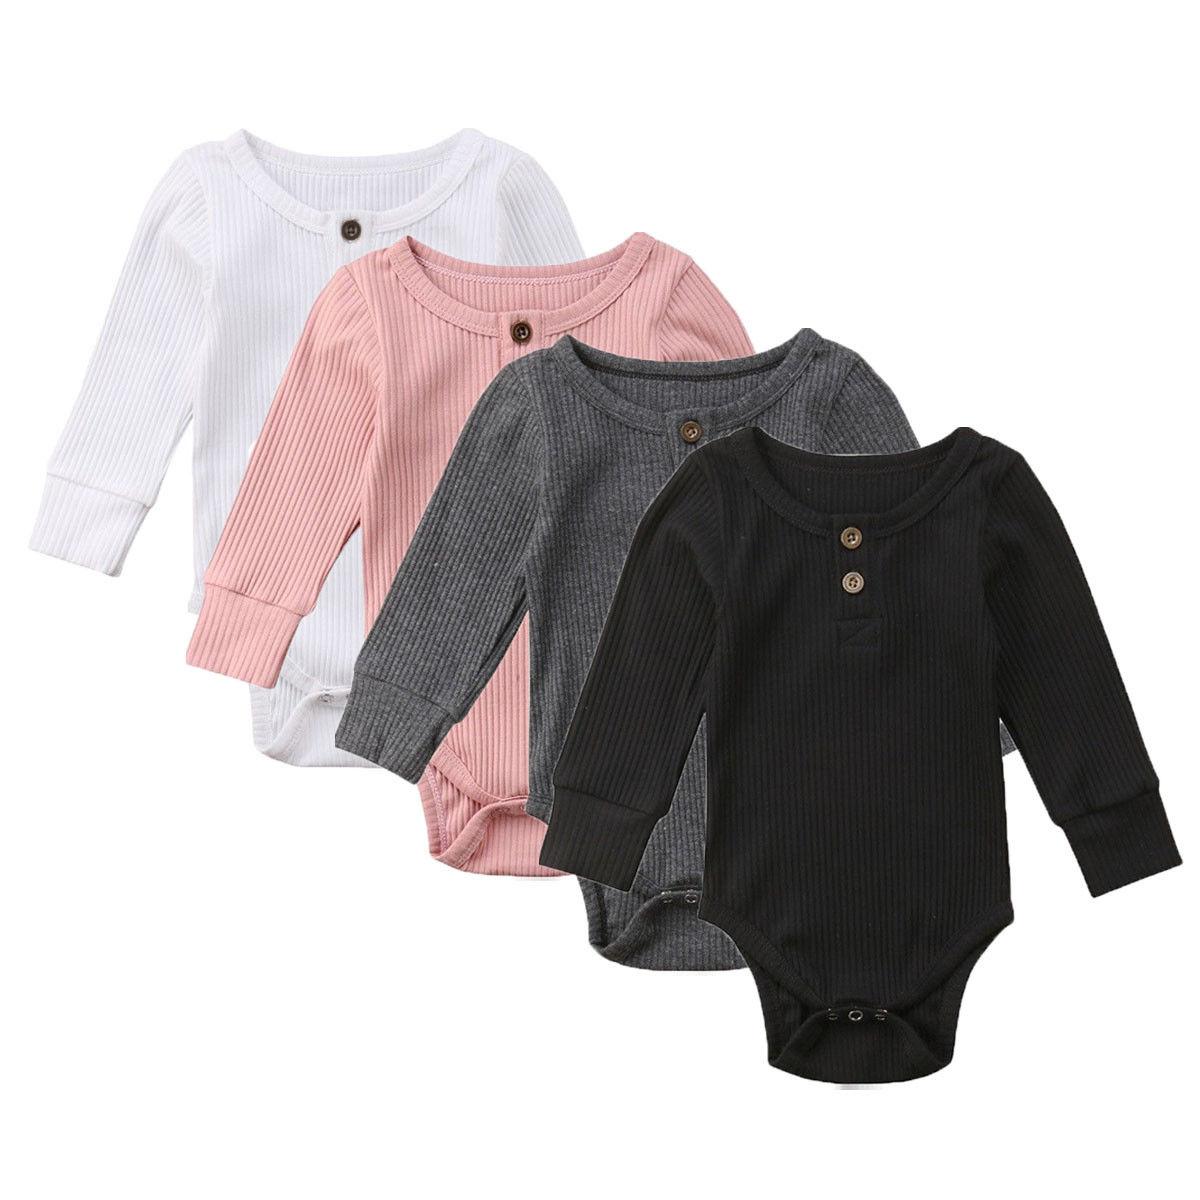 0-24M Newborn Baby Girl Boy Bodysuit Autumn Winter Solid Cotton Long Sleeve Bodysuit O-neck Jumpsuit Outfit